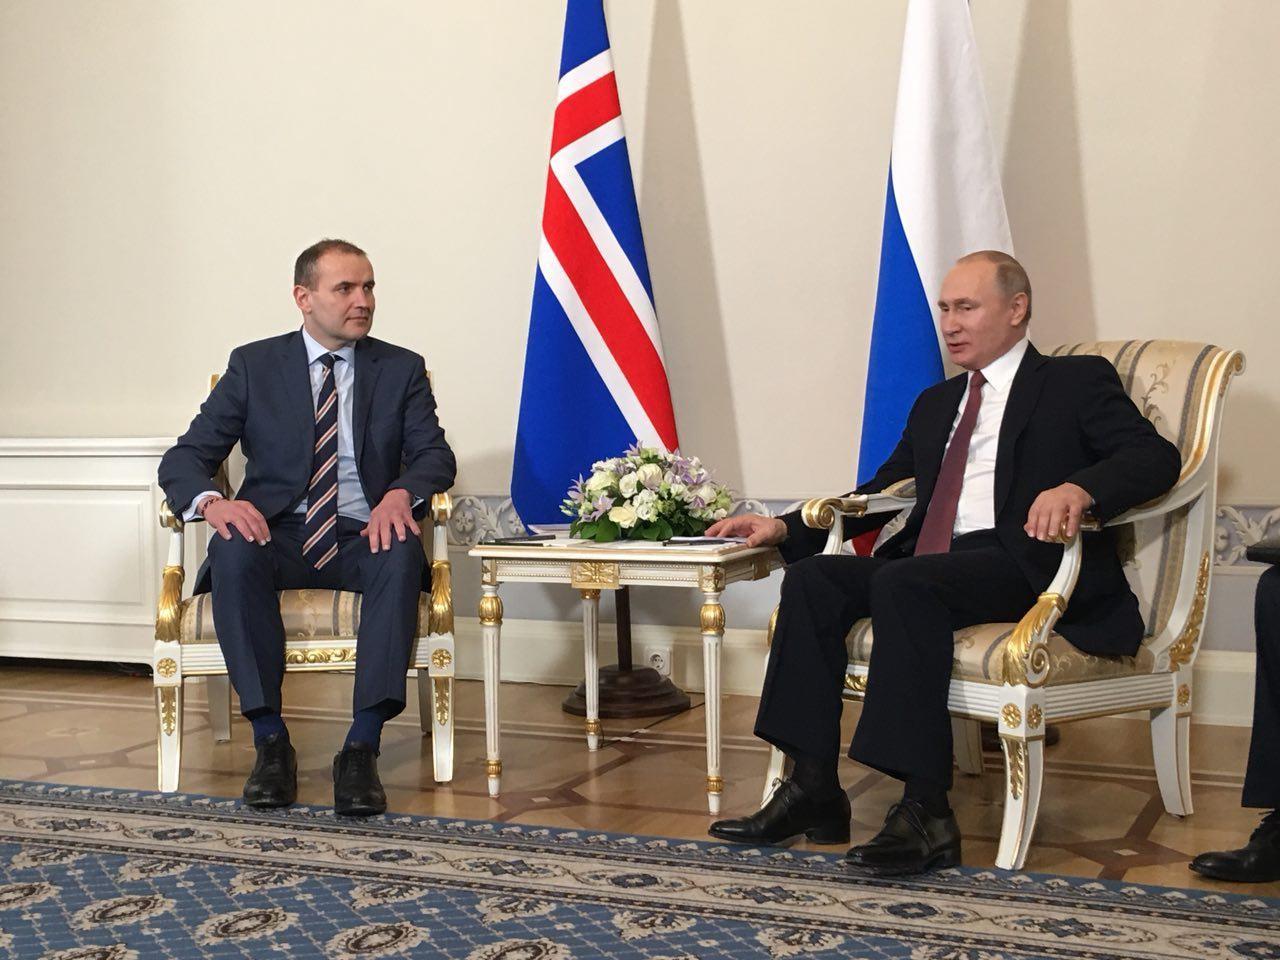 <p>Гудни Йоуханнессон, Владимир Путин. Фото: ©L!FE/Павел Баранов</p>